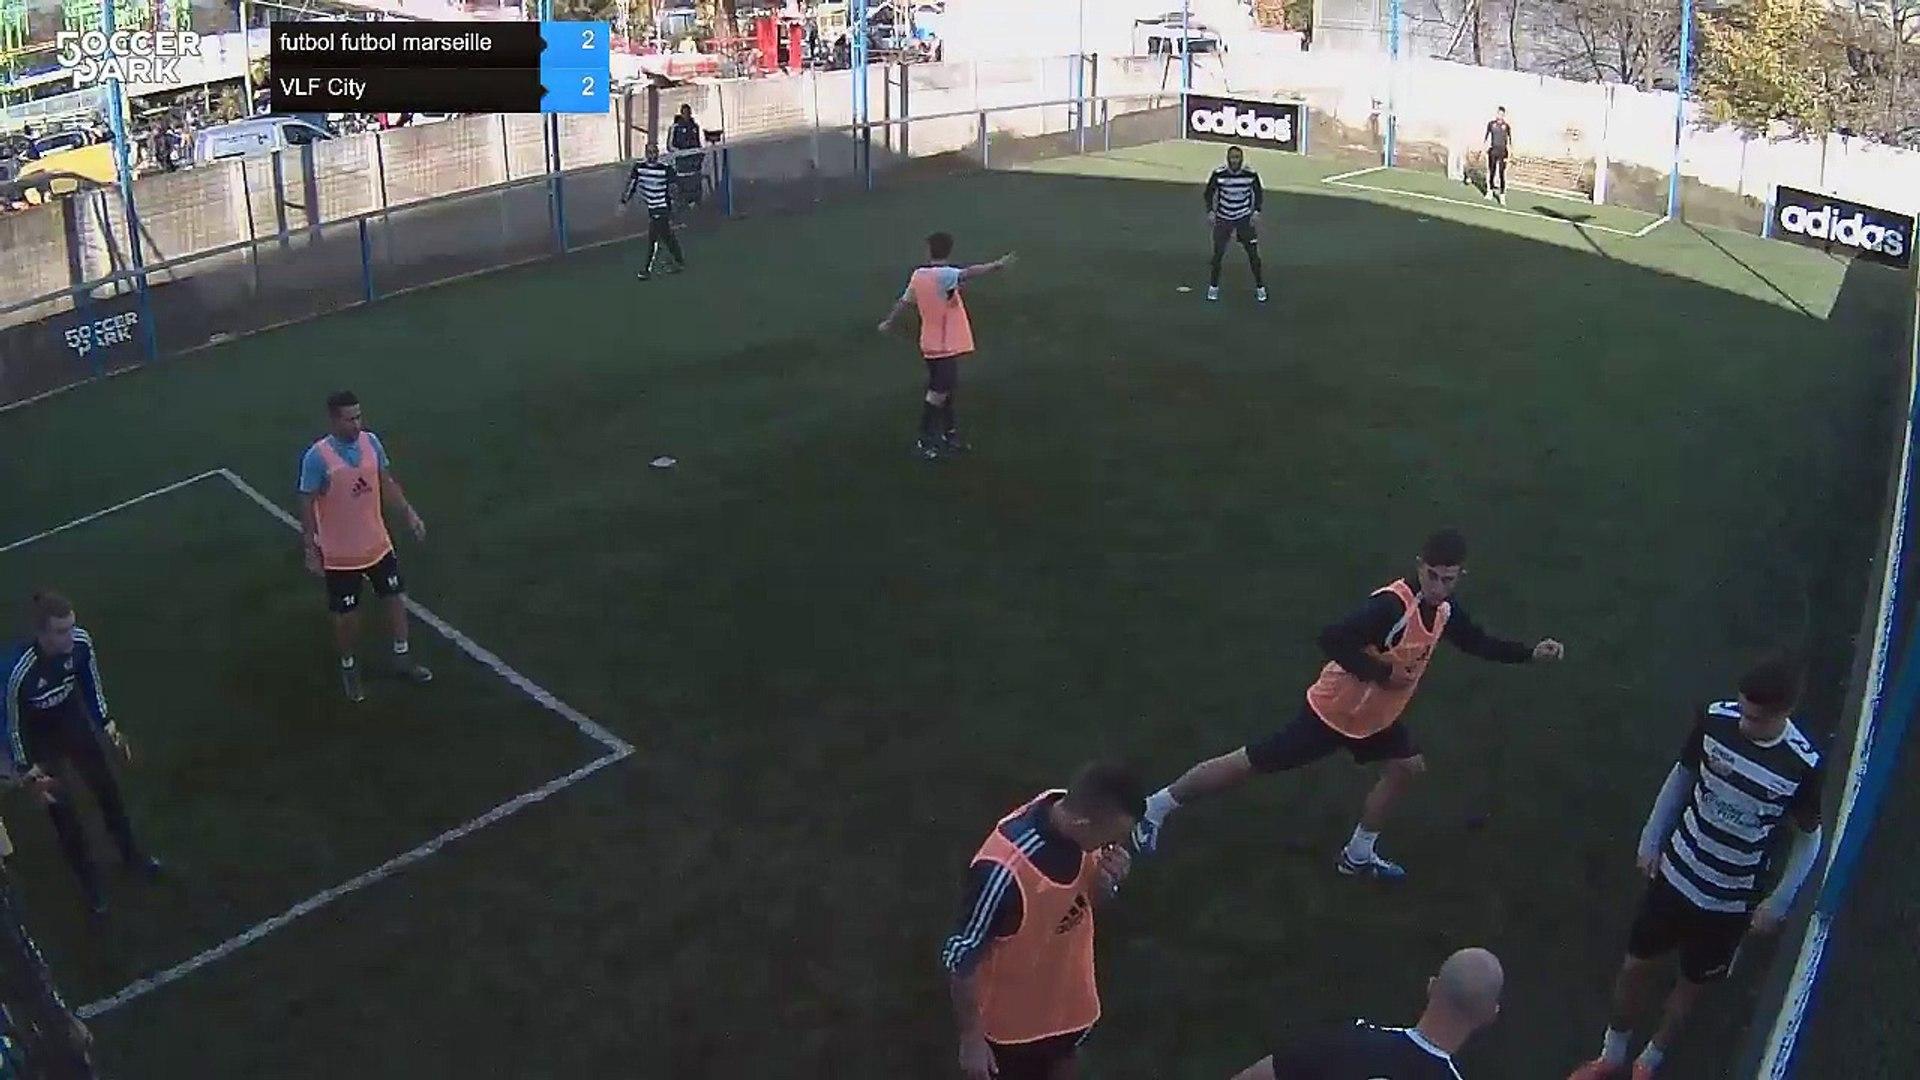 futbol futbol marseille Vs VLF City - 12/12/15 11:22 - F5WC Finale regionale - Antibes Soccer Park